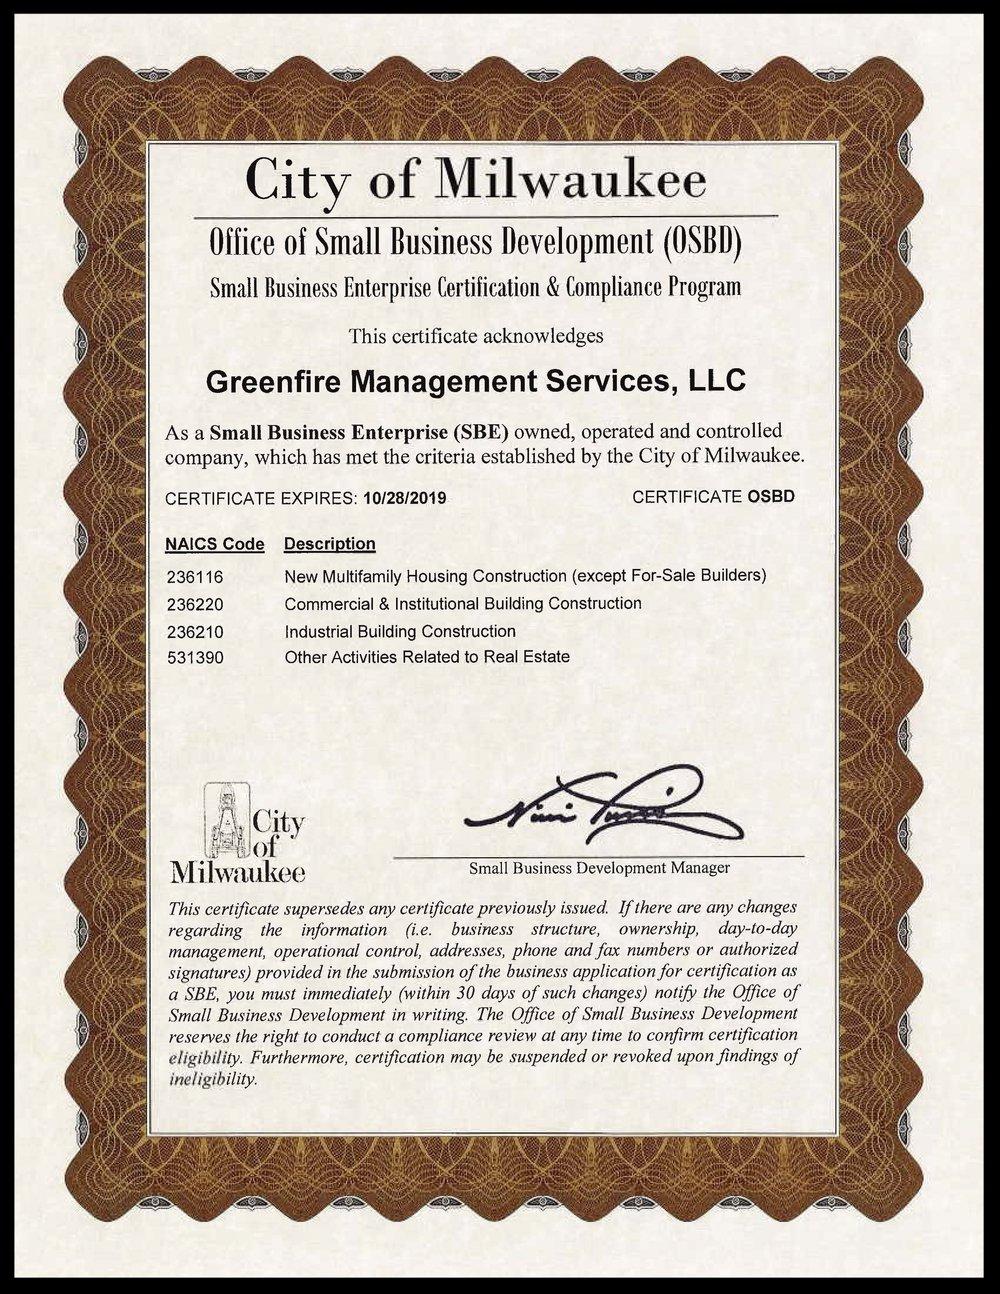 City of Milwaukee SBE Exp. 3.28.17 - Certificate.jpg